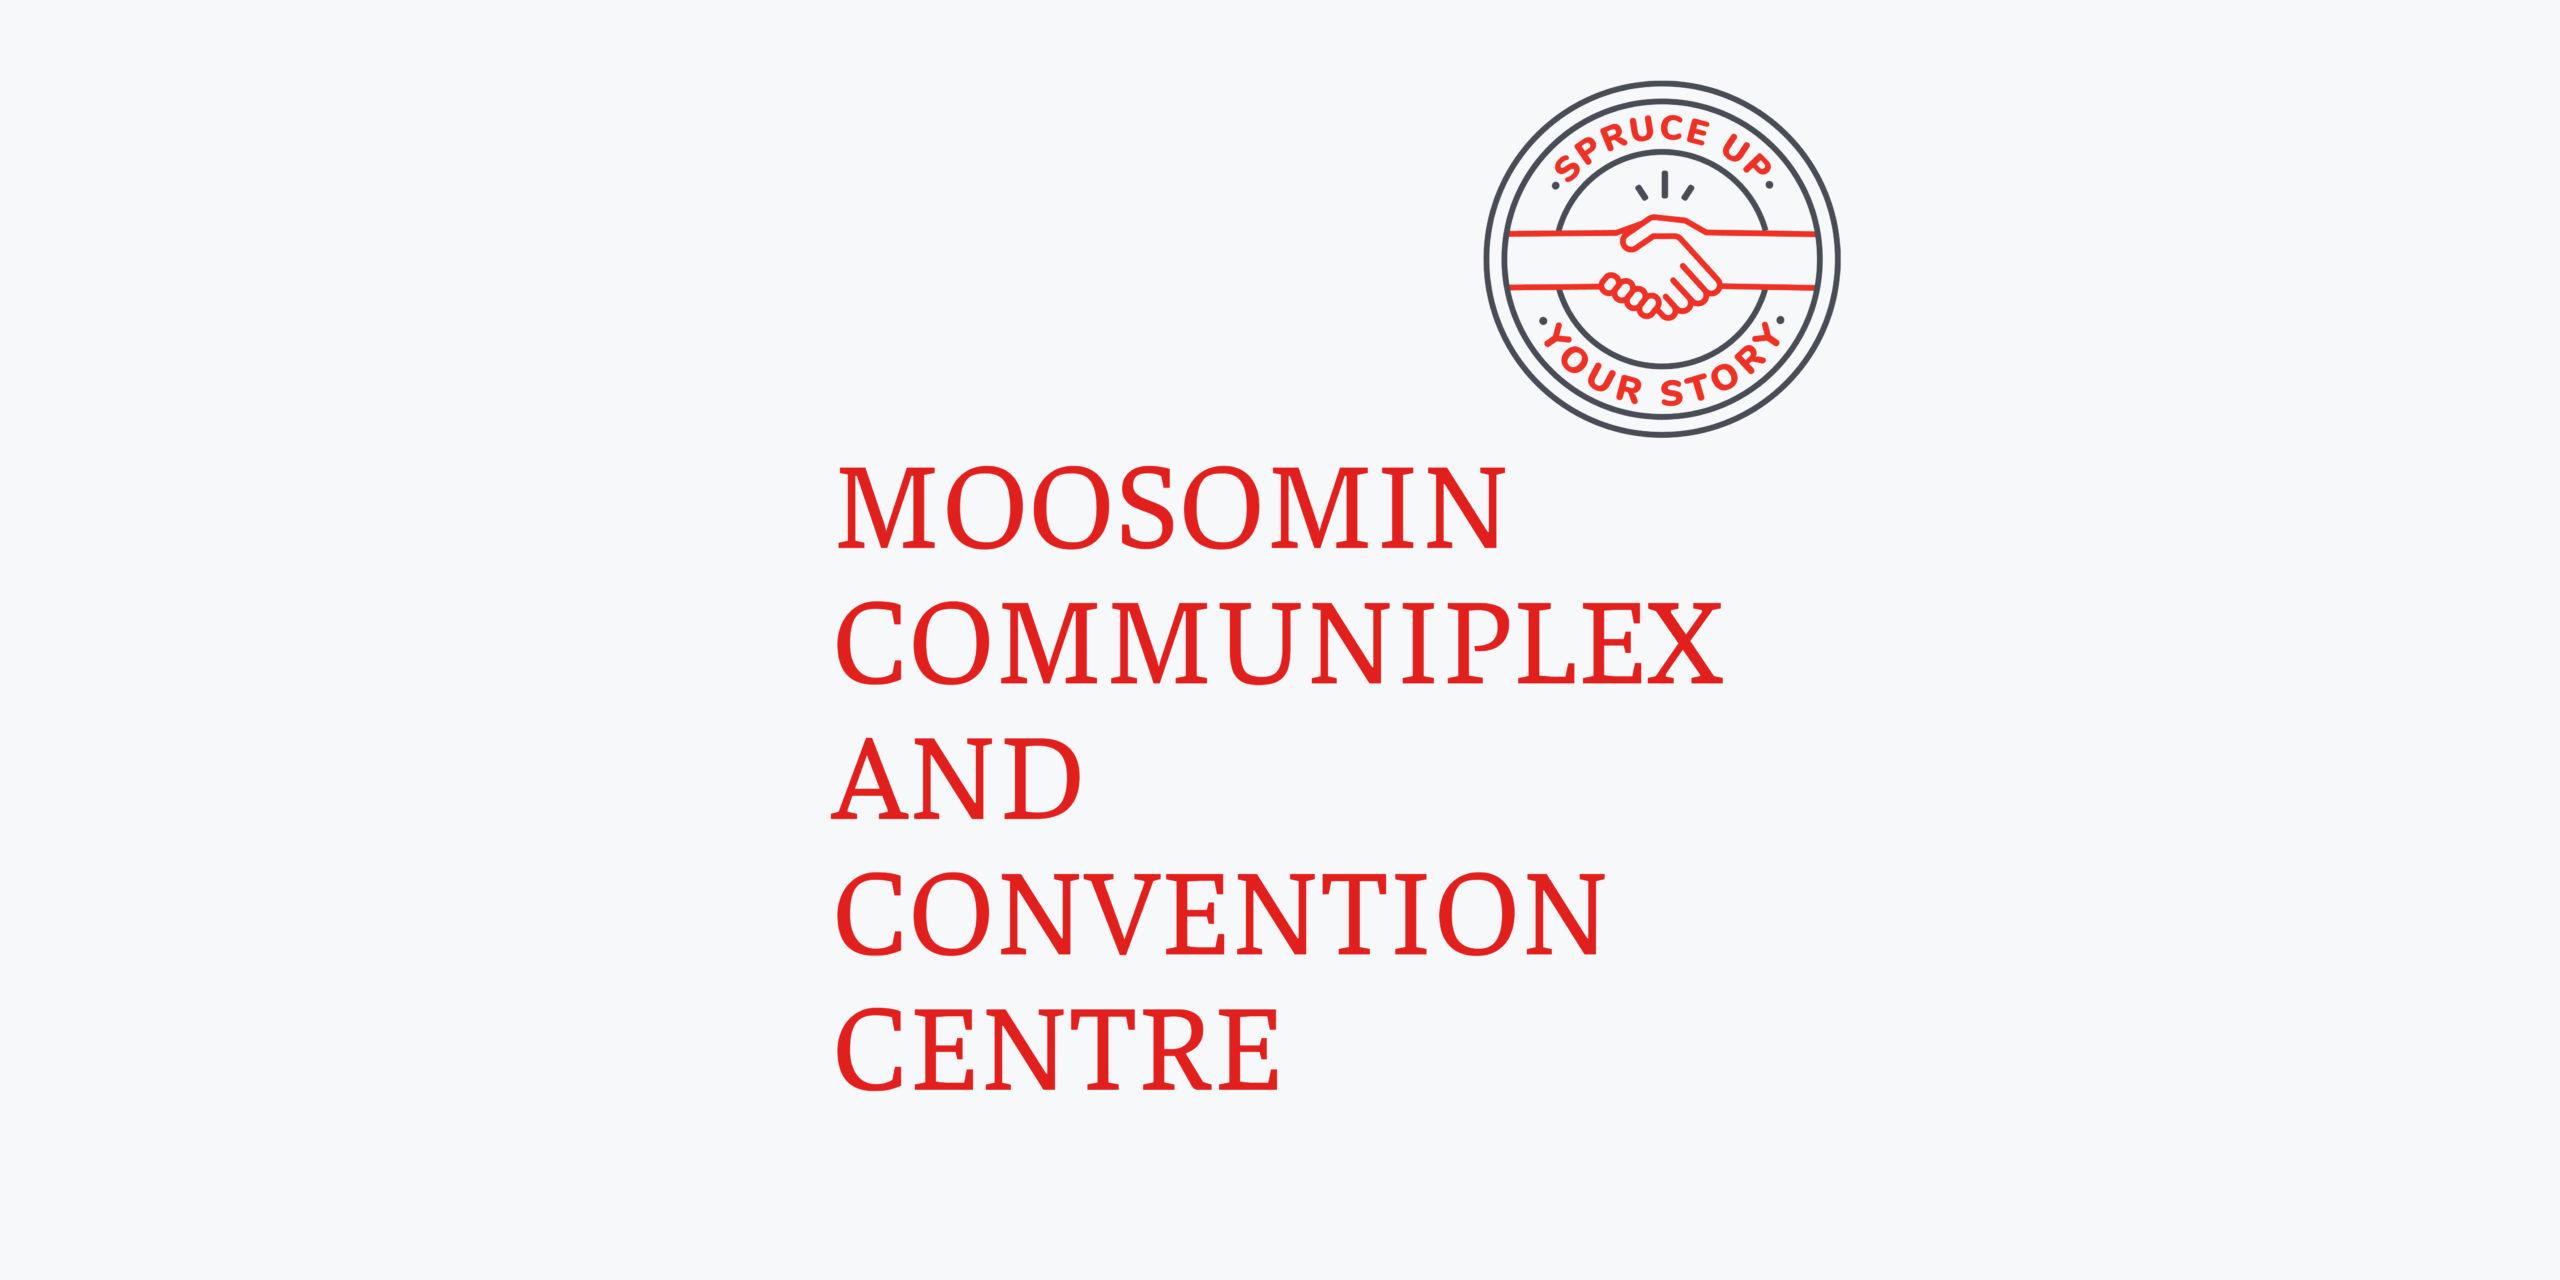 Moosomin Communiplex